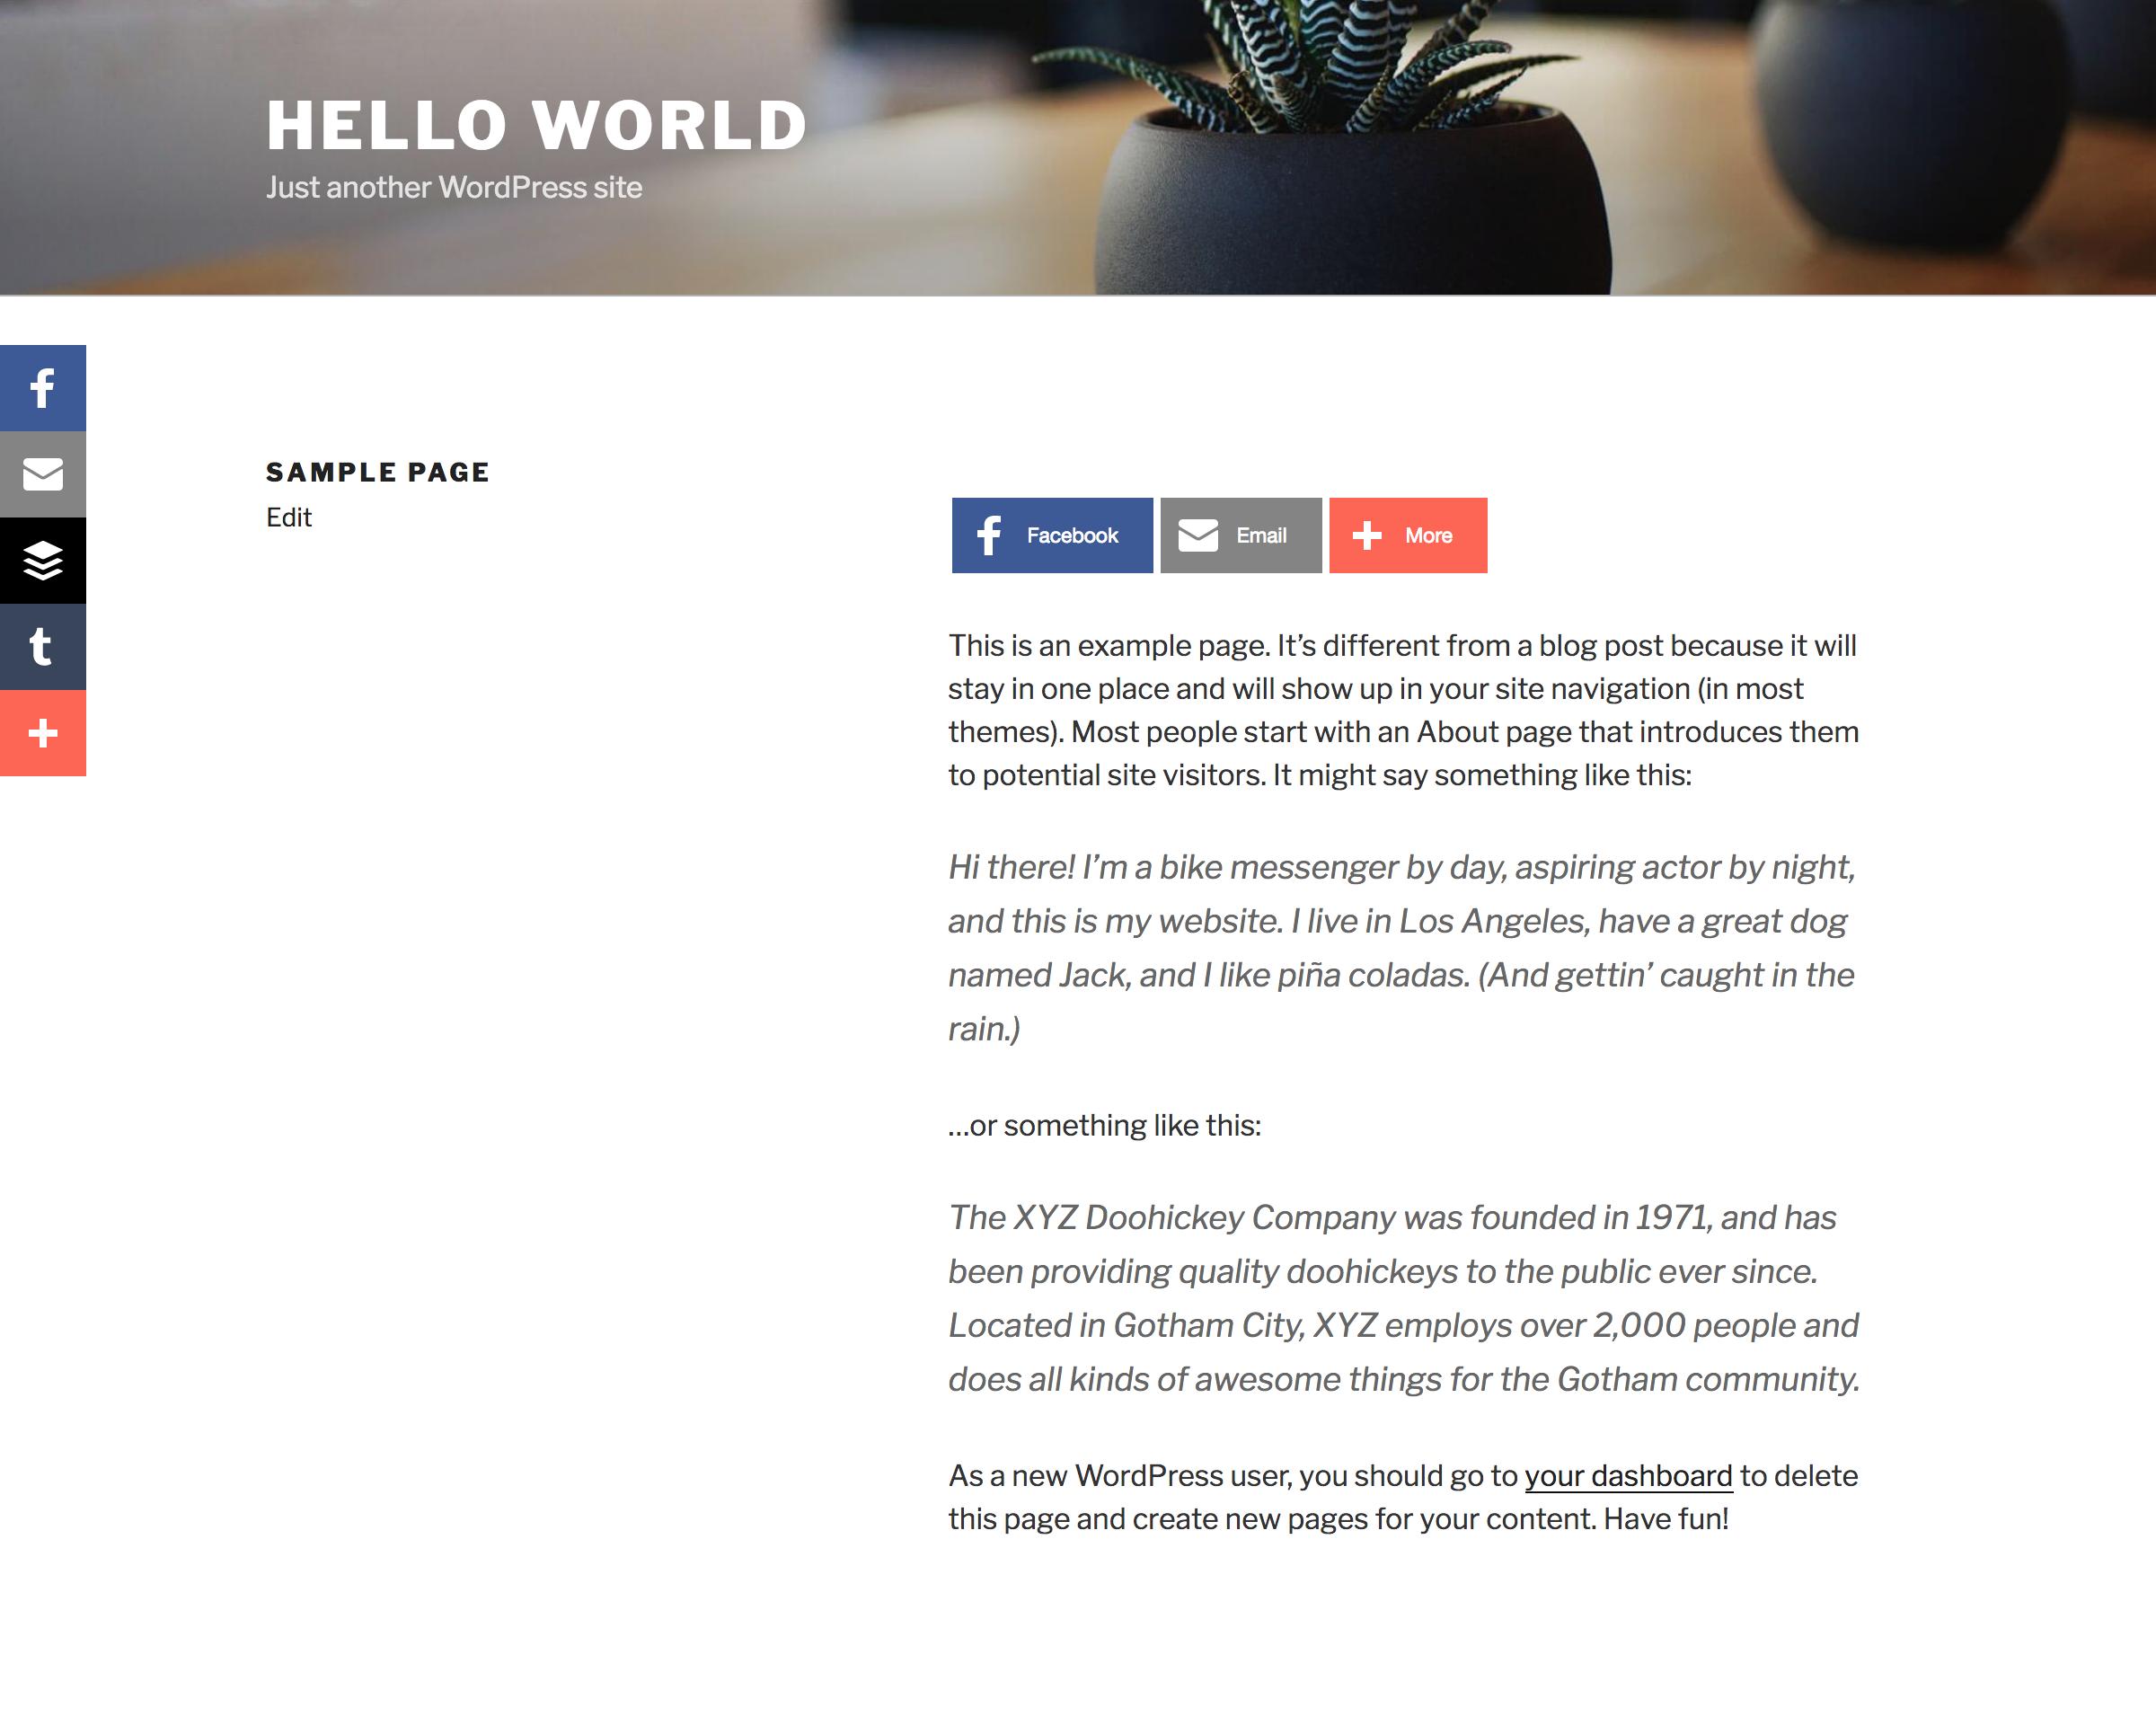 WordPress dejtingsajt plugin Hur ofta till text tidig dating